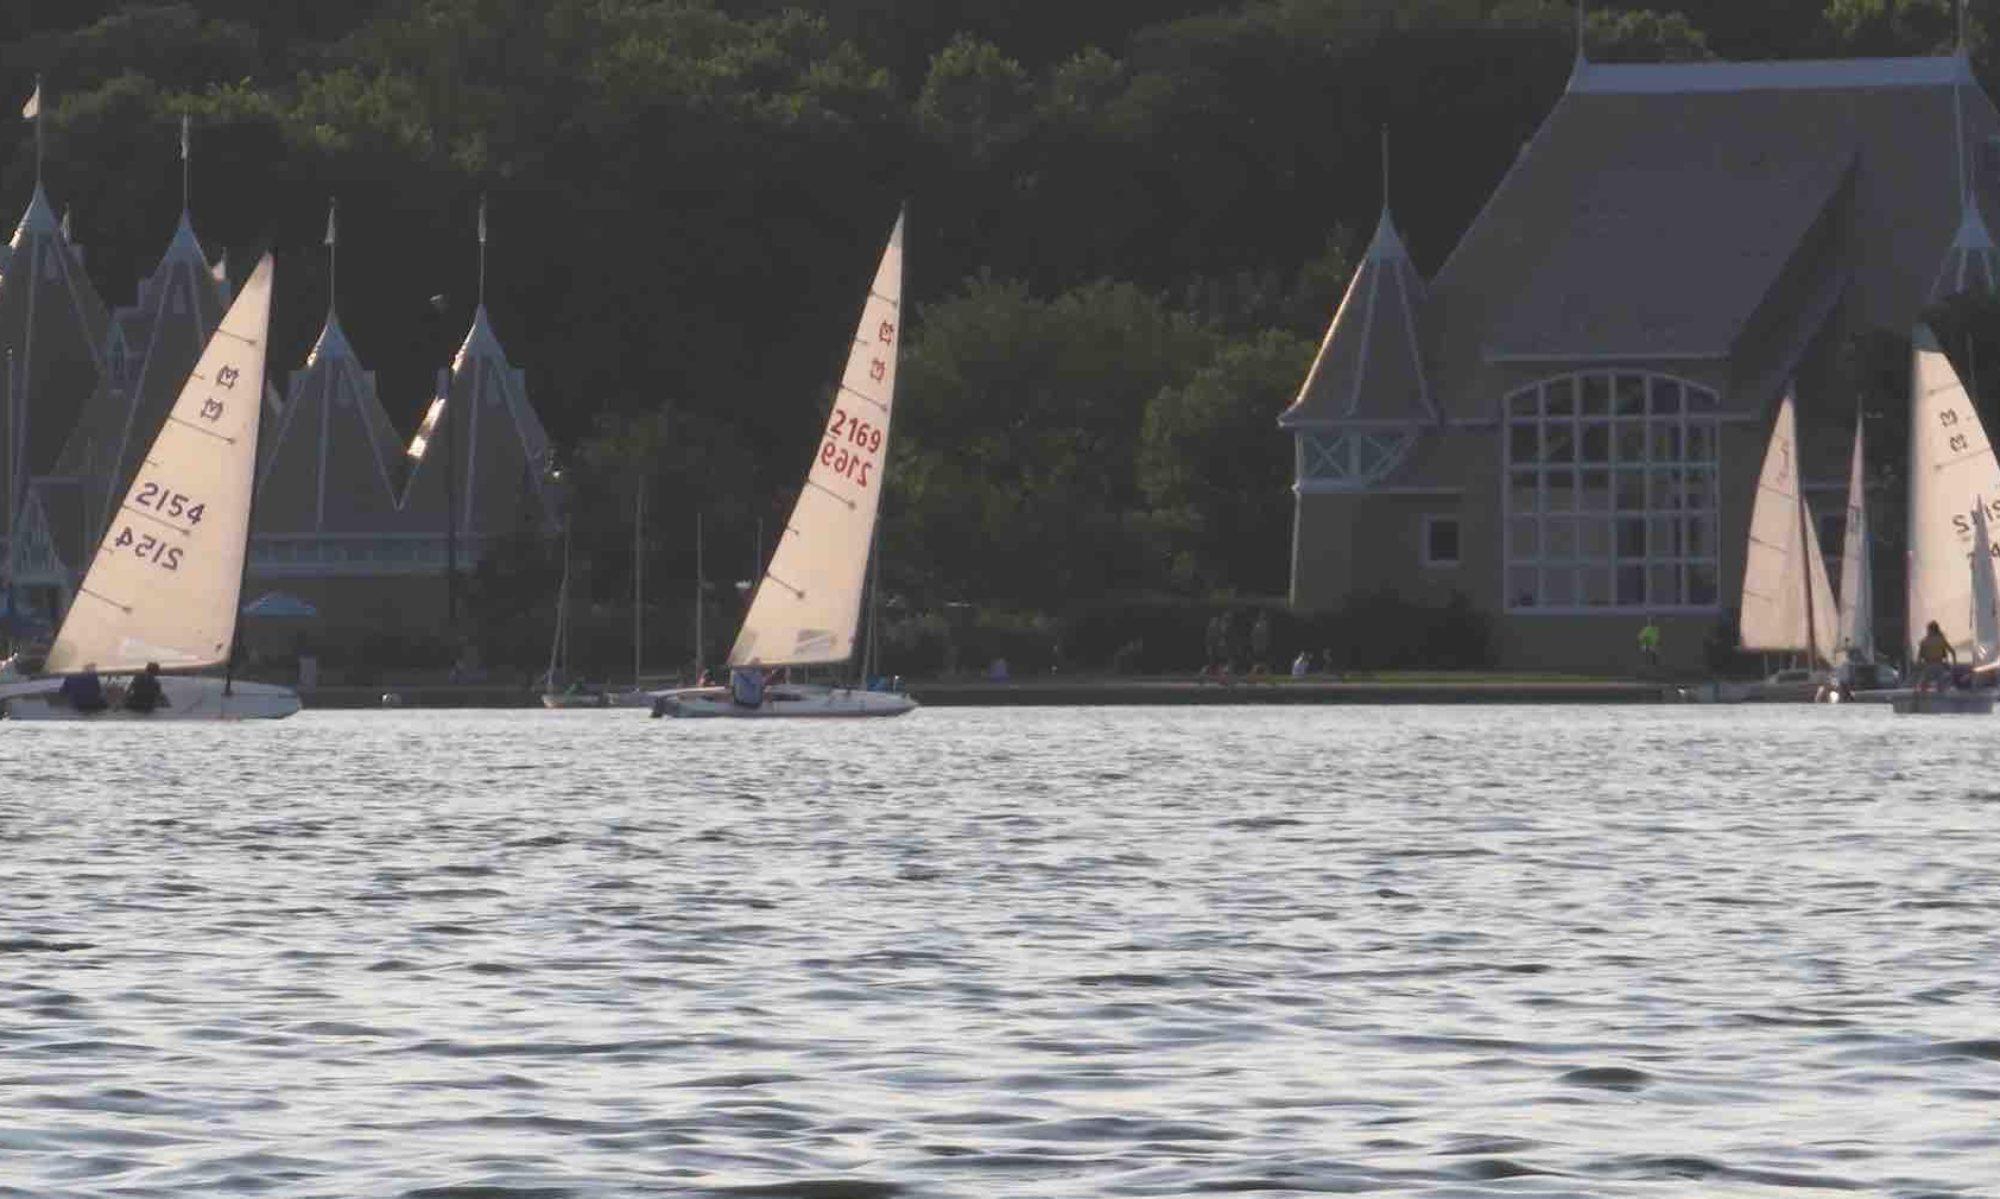 Twin Cities Sailing Club